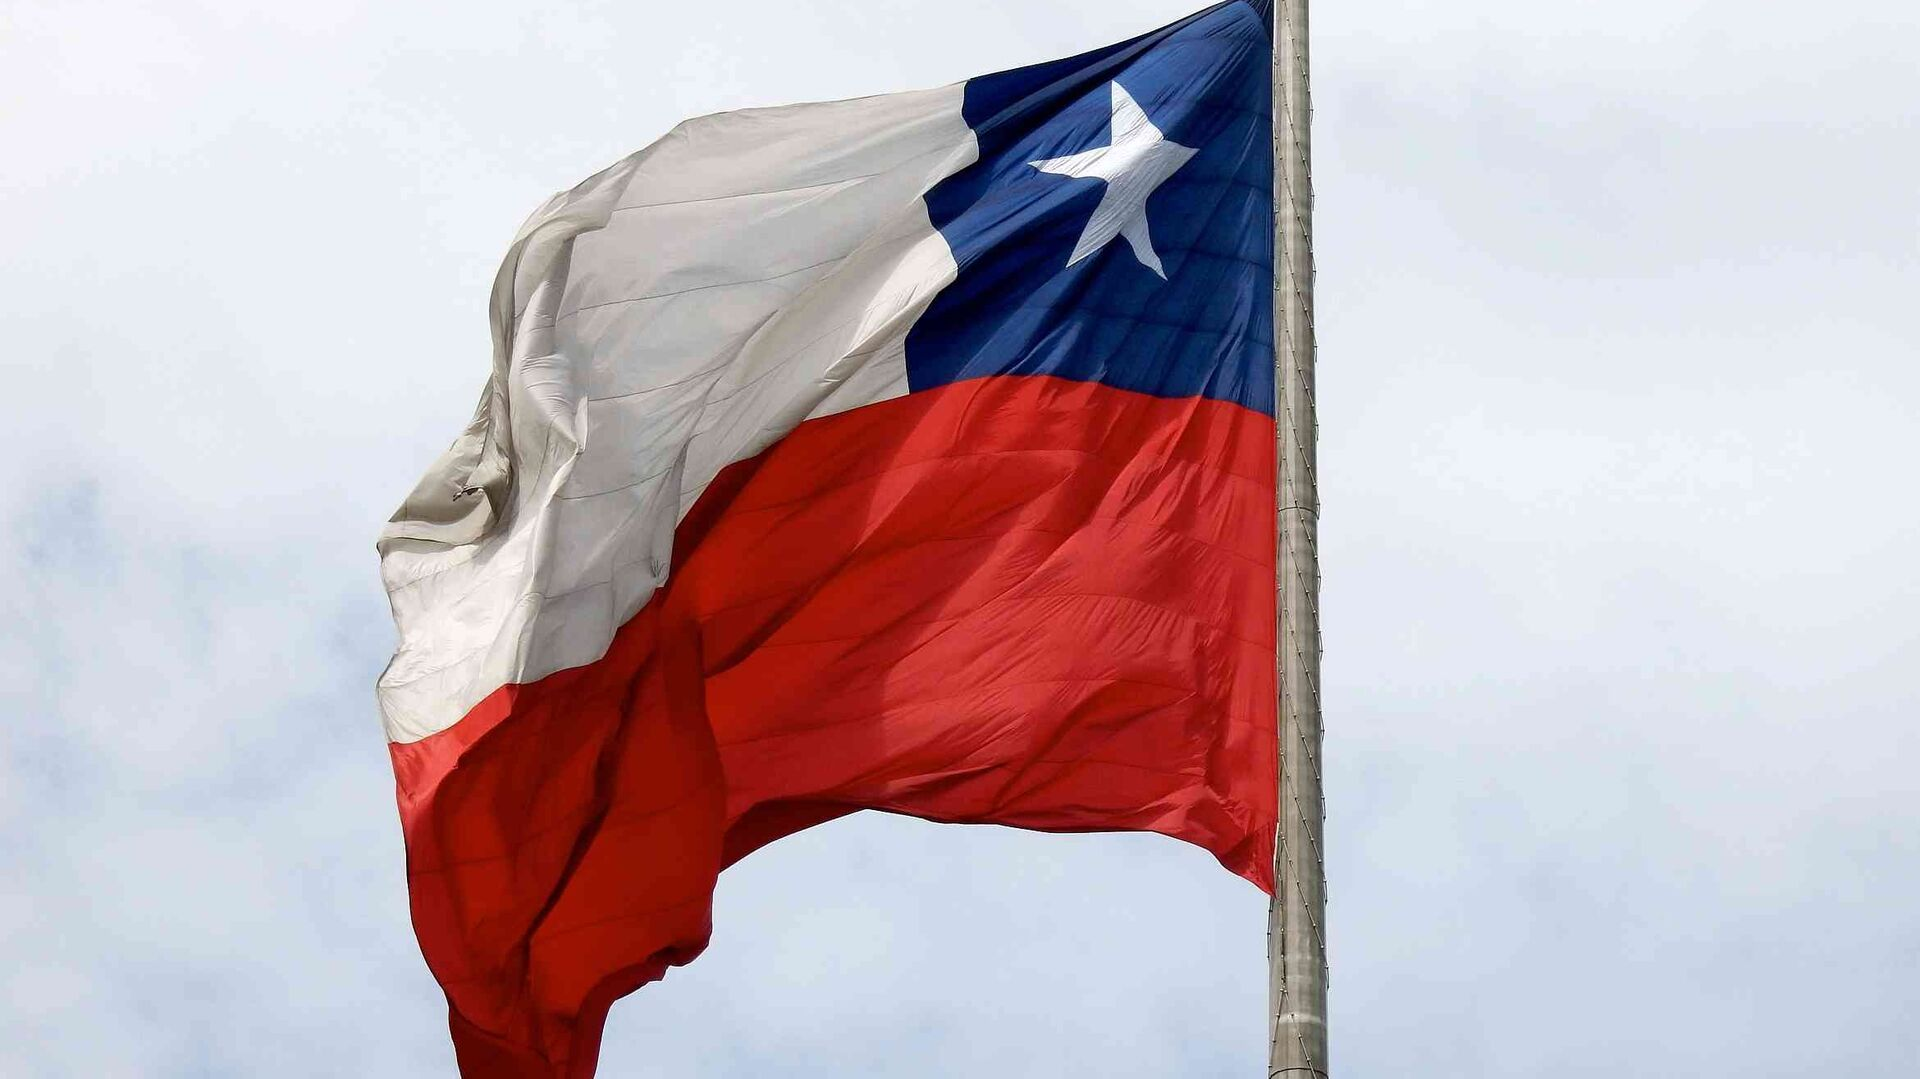 Bandera de Chile - Sputnik Mundo, 1920, 04.10.2021